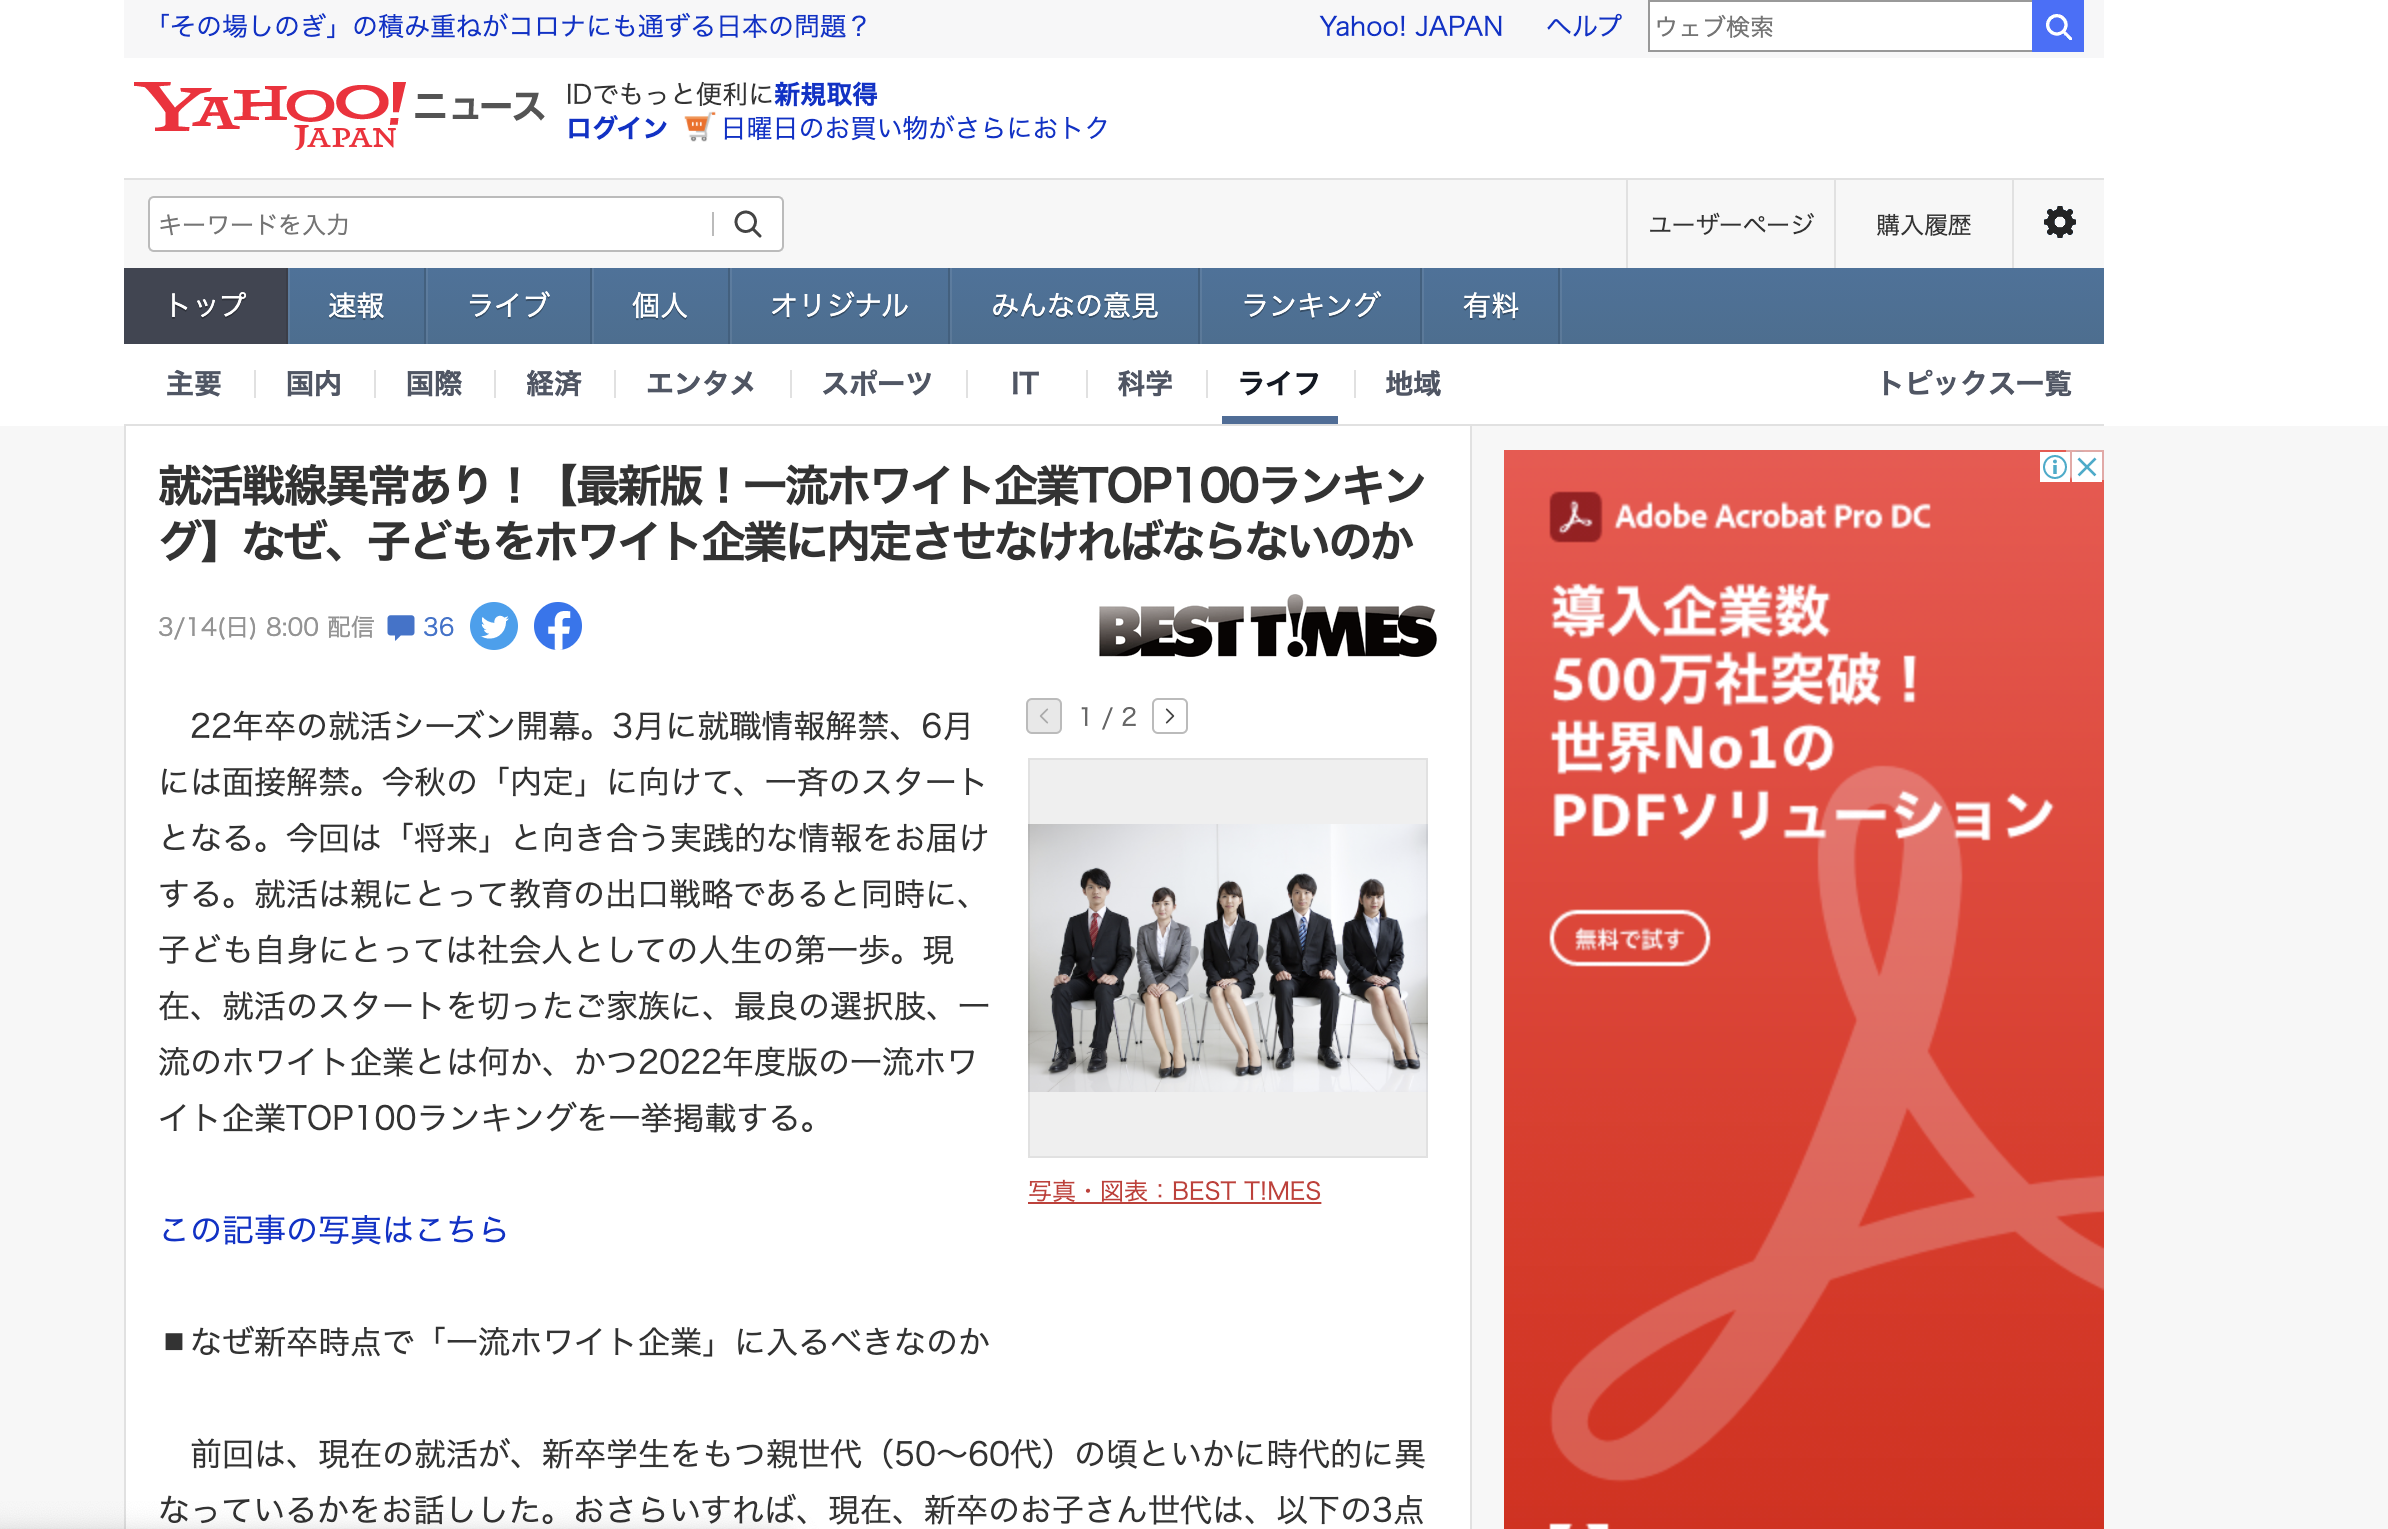 Yahoonewsでの紹介記事